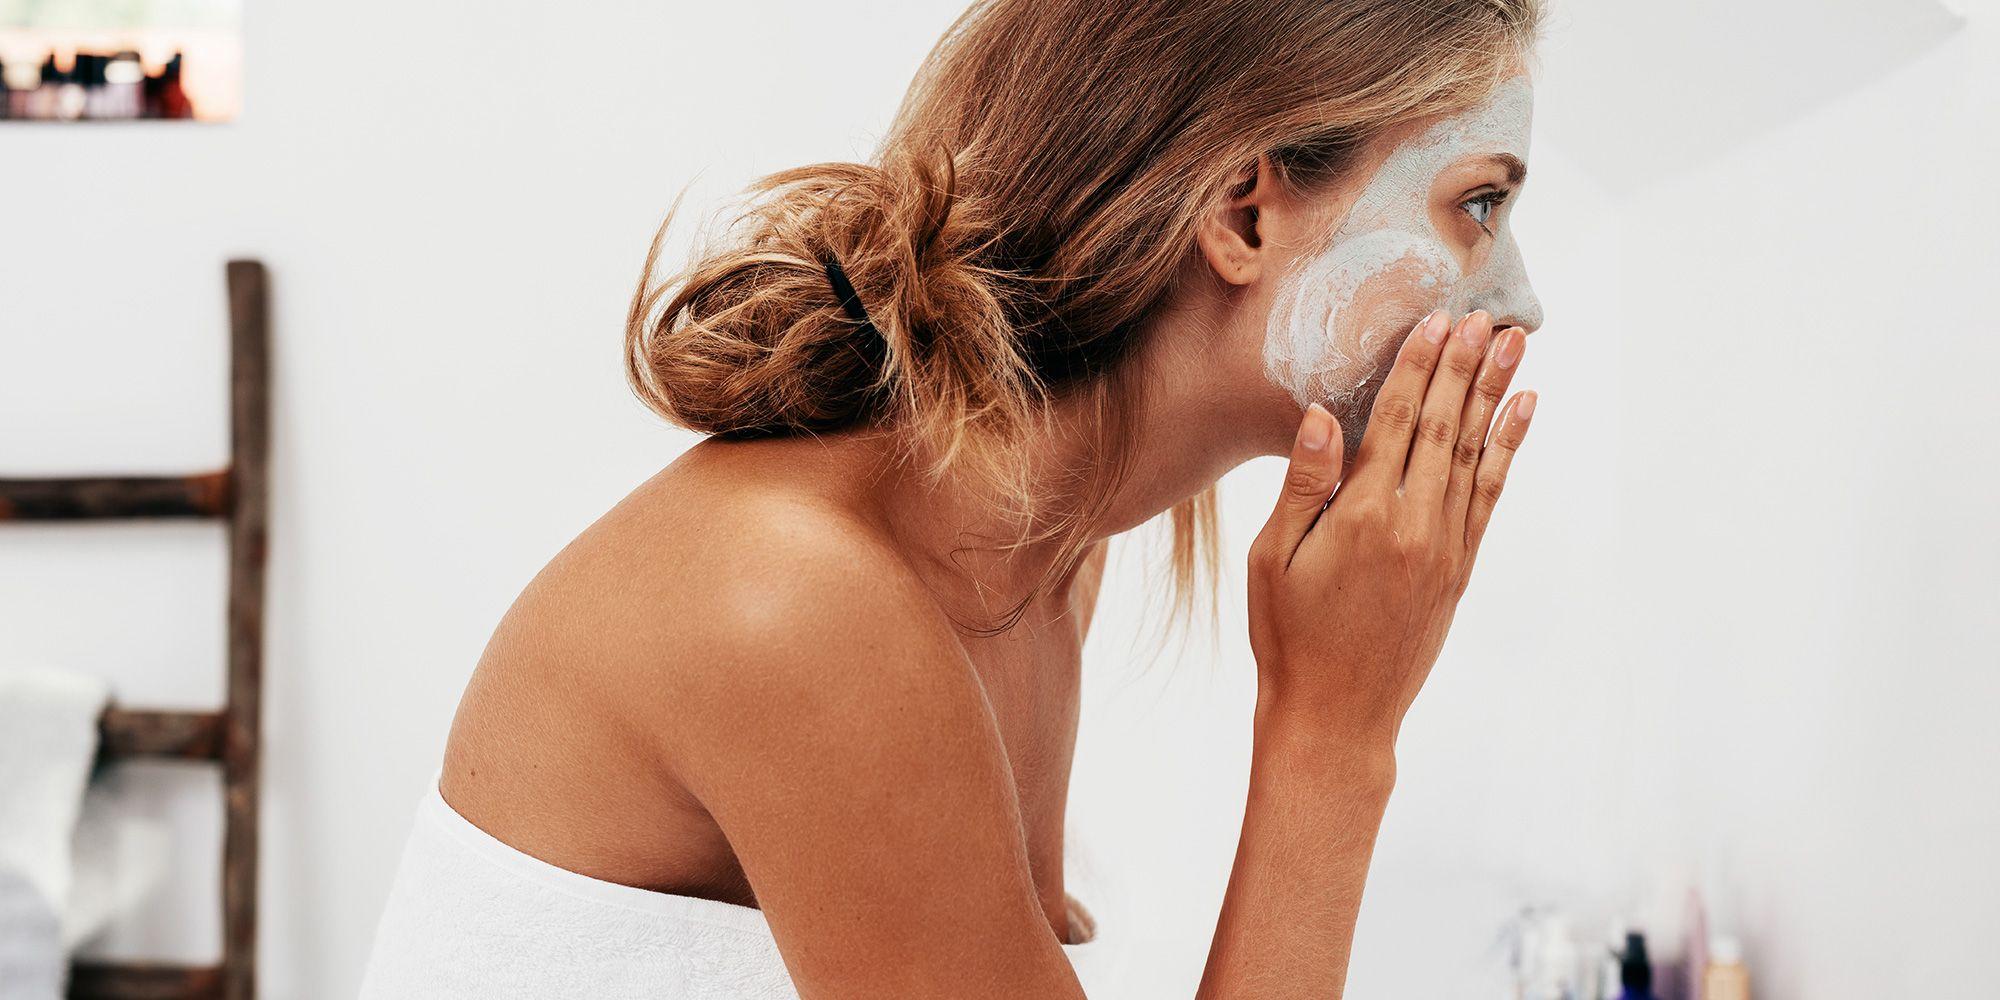 Skincareaddiction Best Acne Products Reddit Skincare